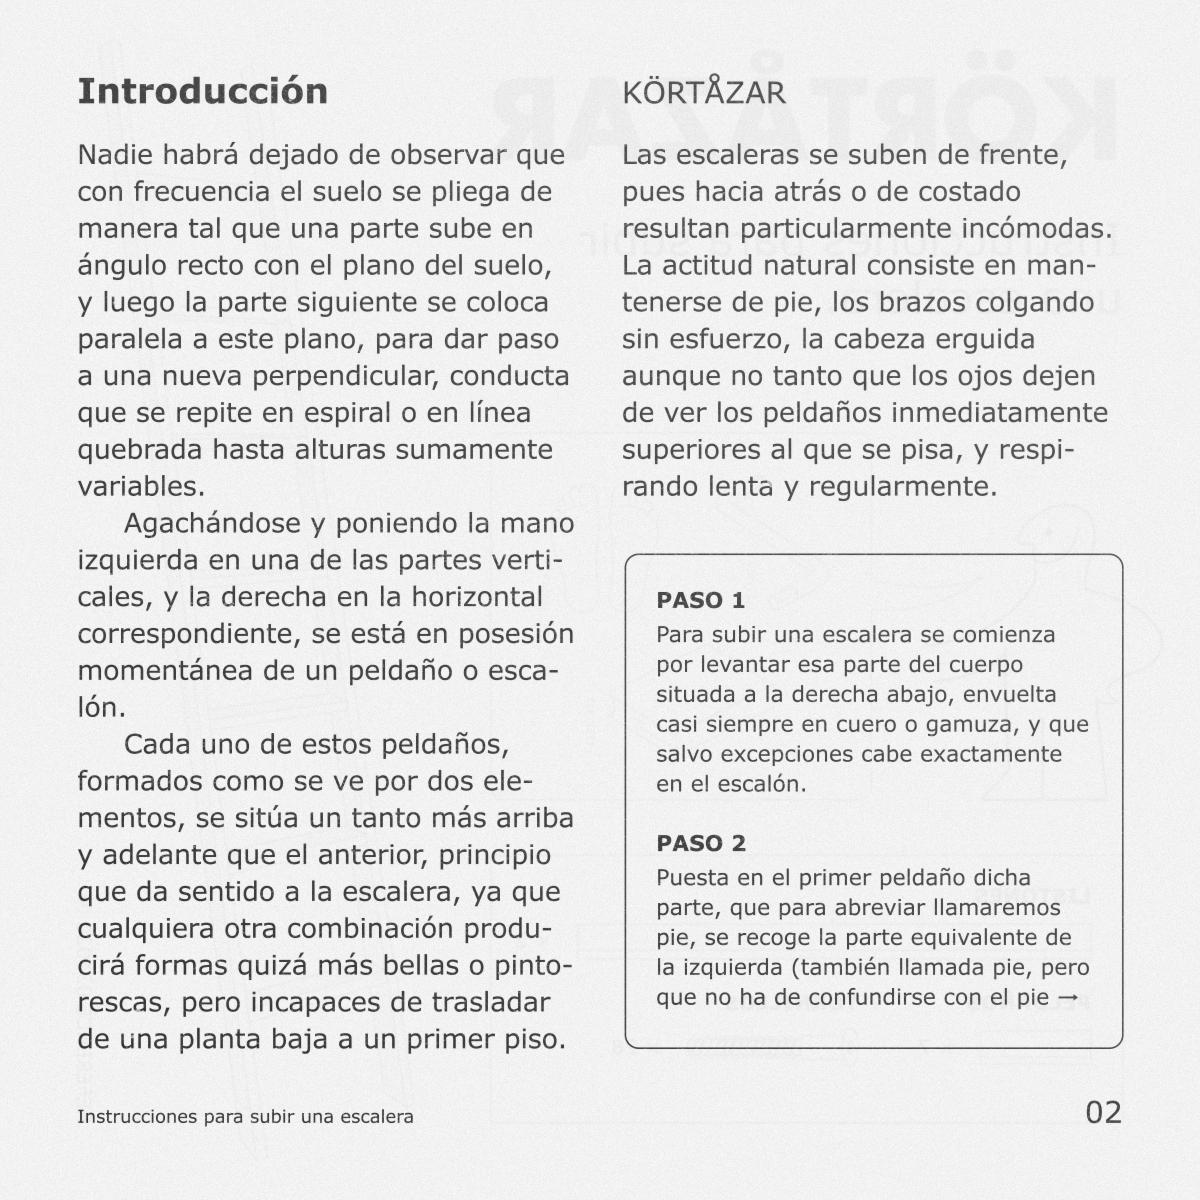 Kortazar_Post_MateoBuitrago-02